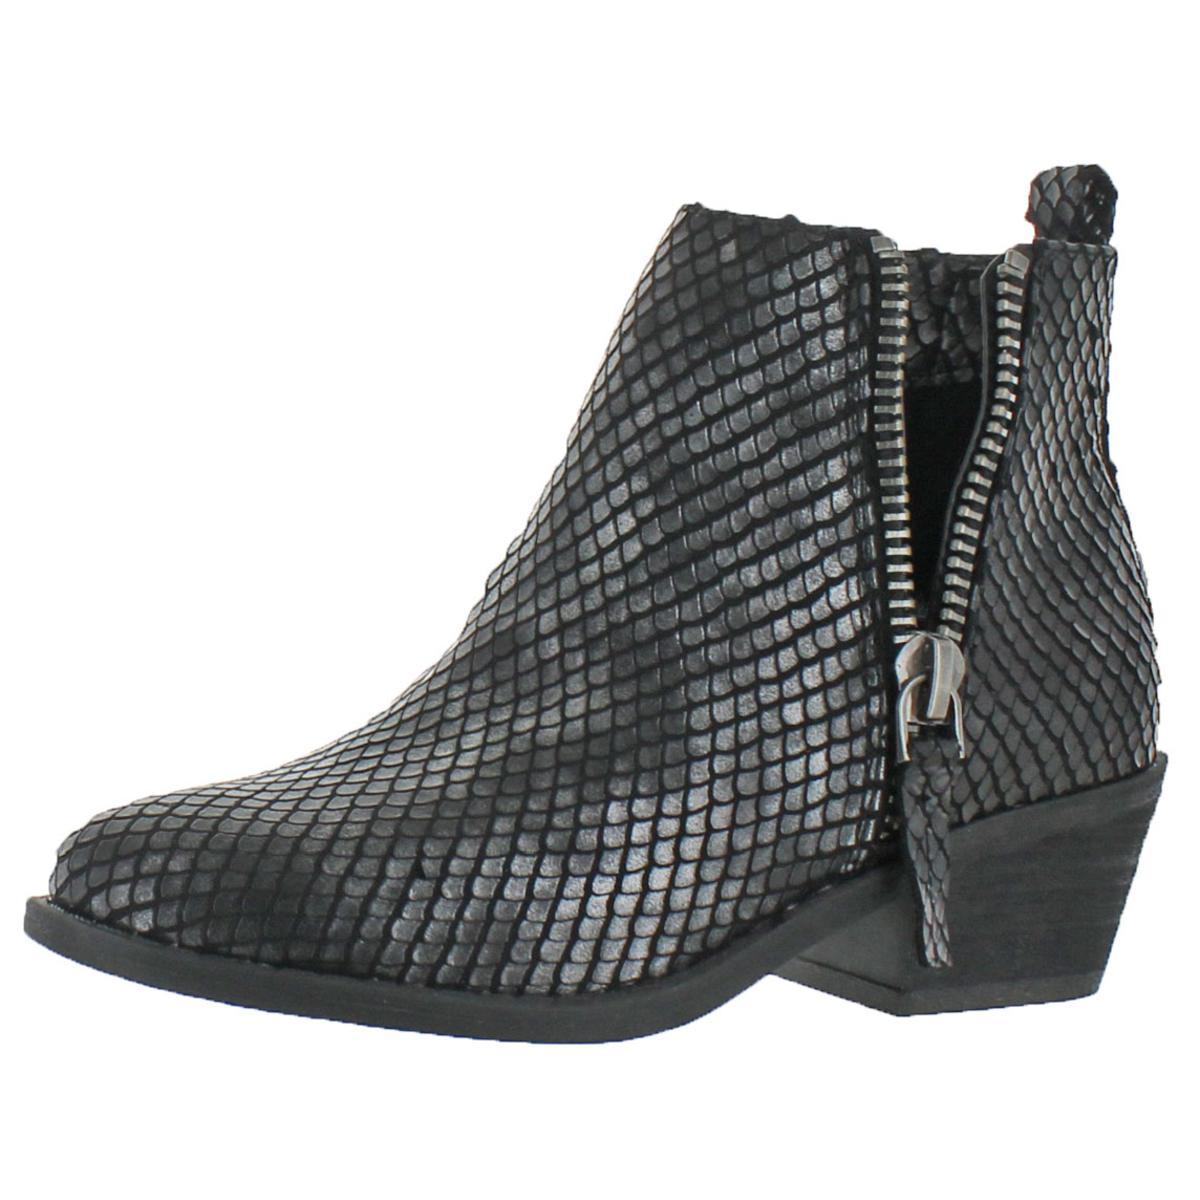 Frye Womens Danica Suede Ankle Open Toe Chelsea Boots Shoes BHFO 7556